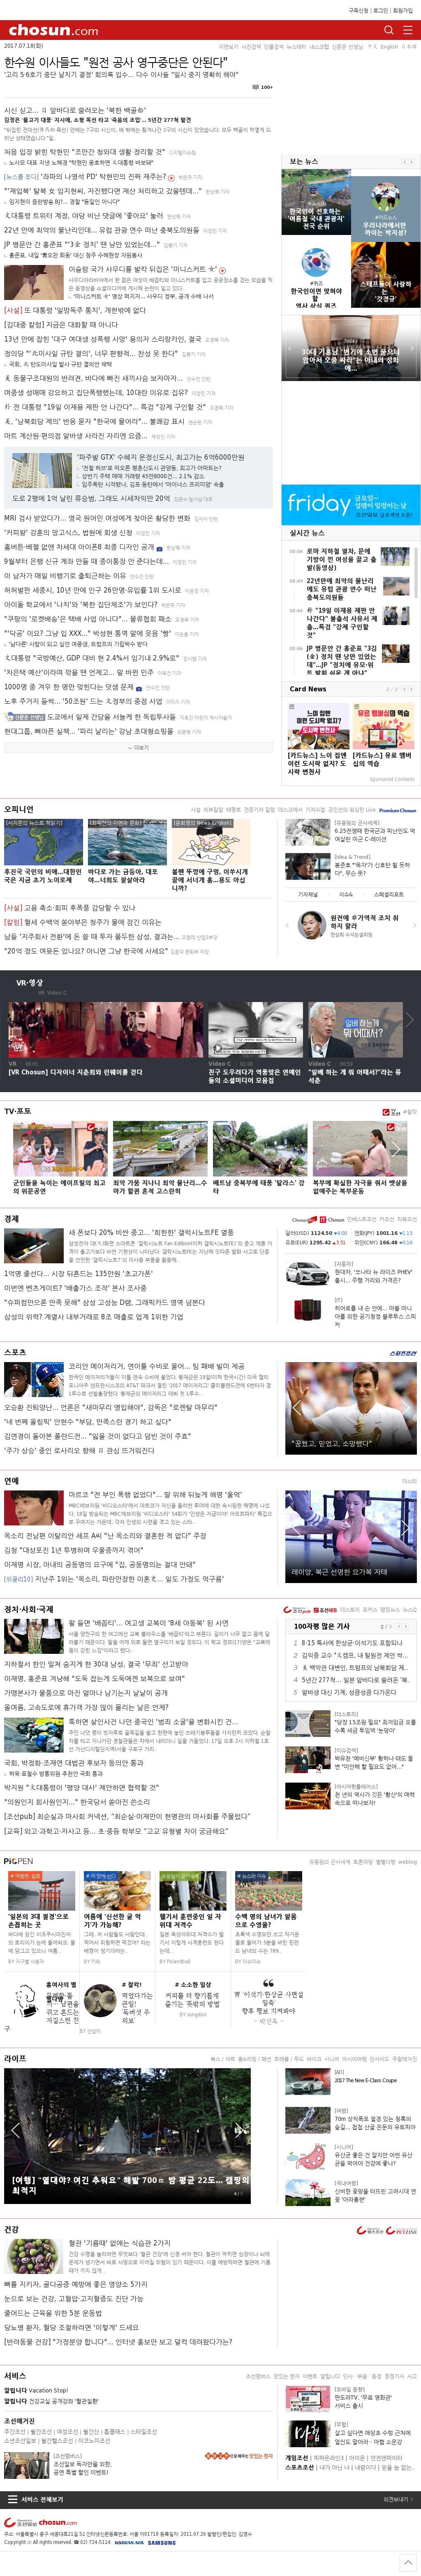 chosun.com at Tuesday July 18, 2017, 9:01 a.m. UTC